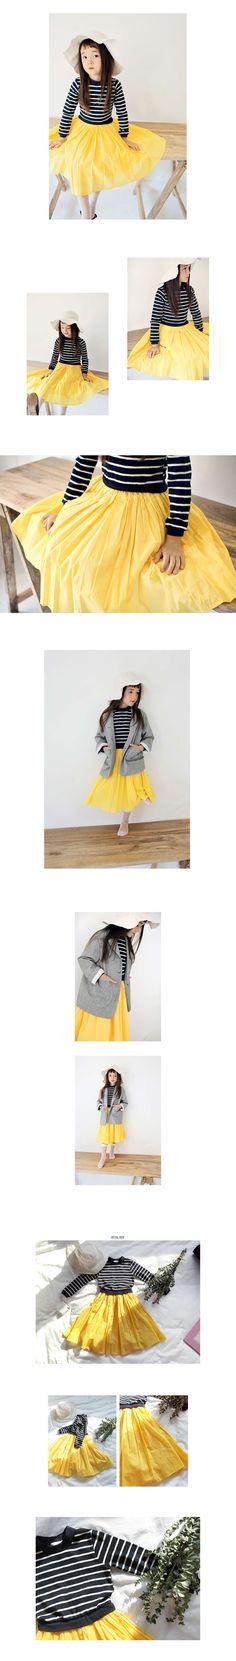 Peach & Cream More Dress (2C) | jujubunnyshop